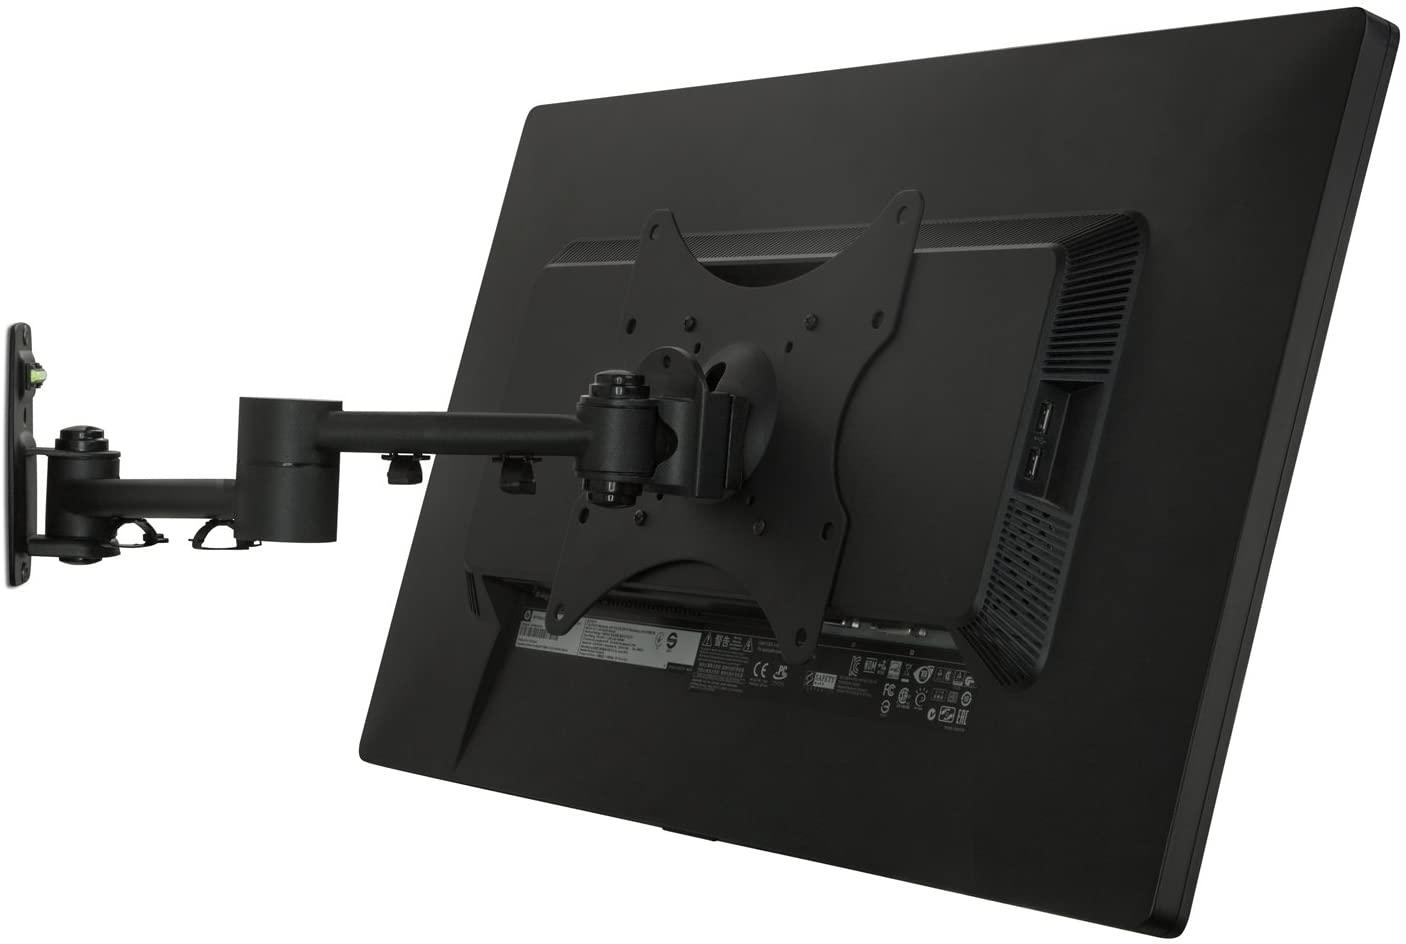 RV TV mount stock photo from Amazon